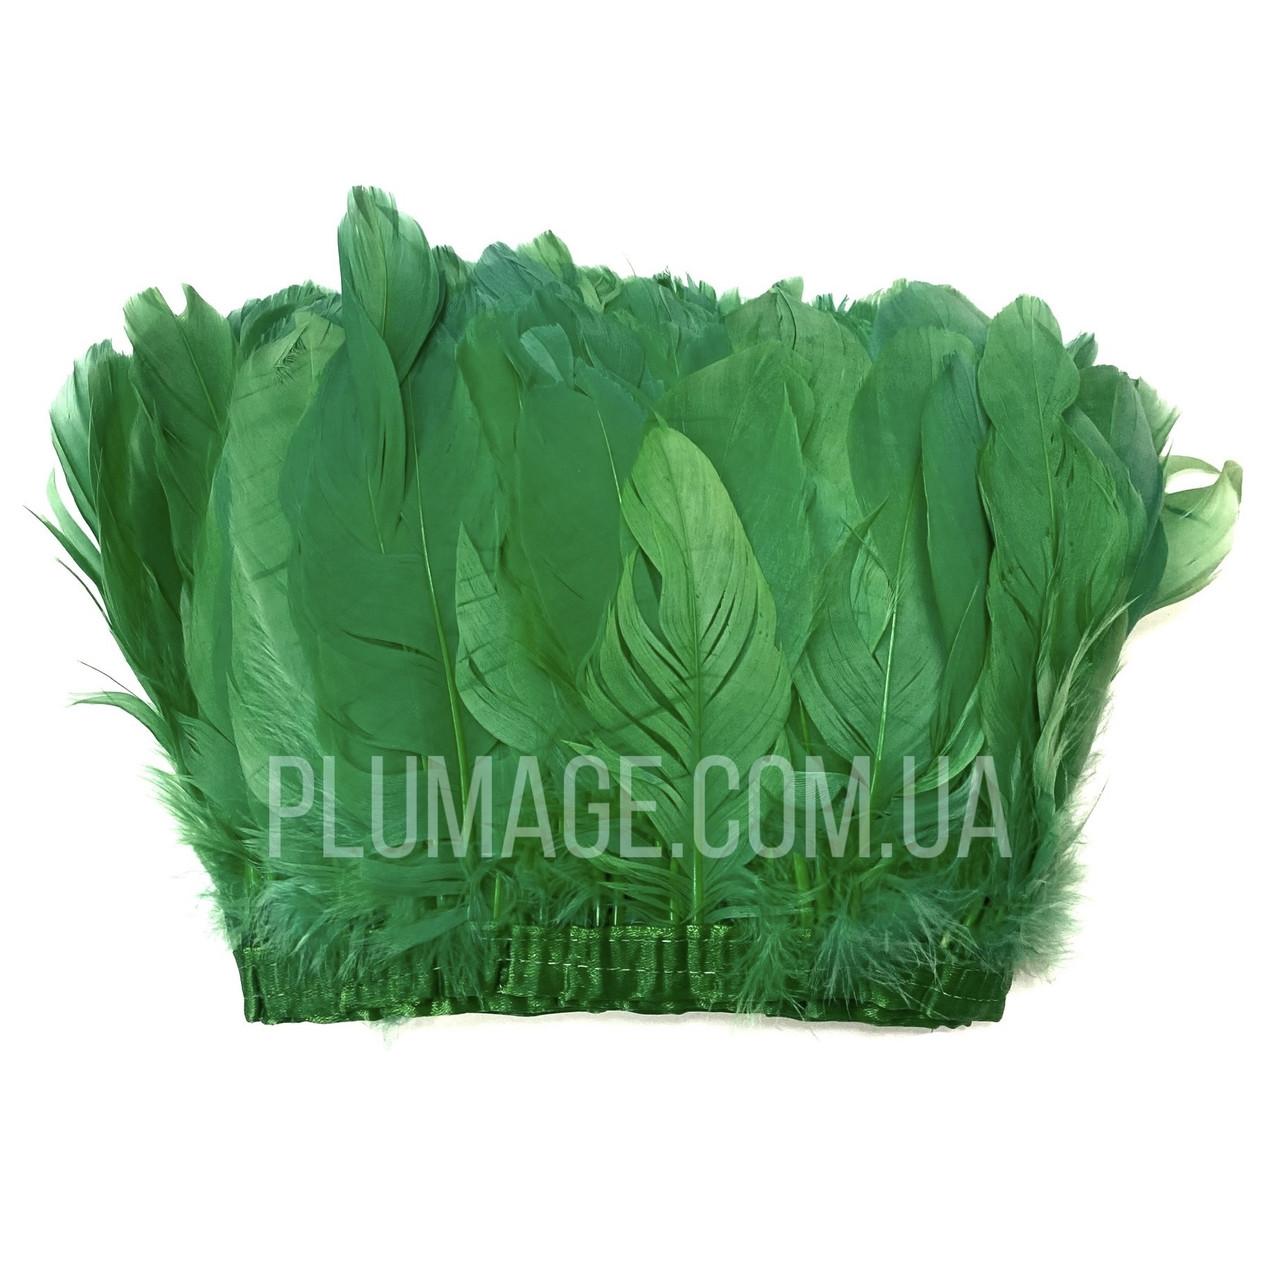 Перьевая тесьма из гусиных перьев. Цвет зеленый. Цена за 0,5 м